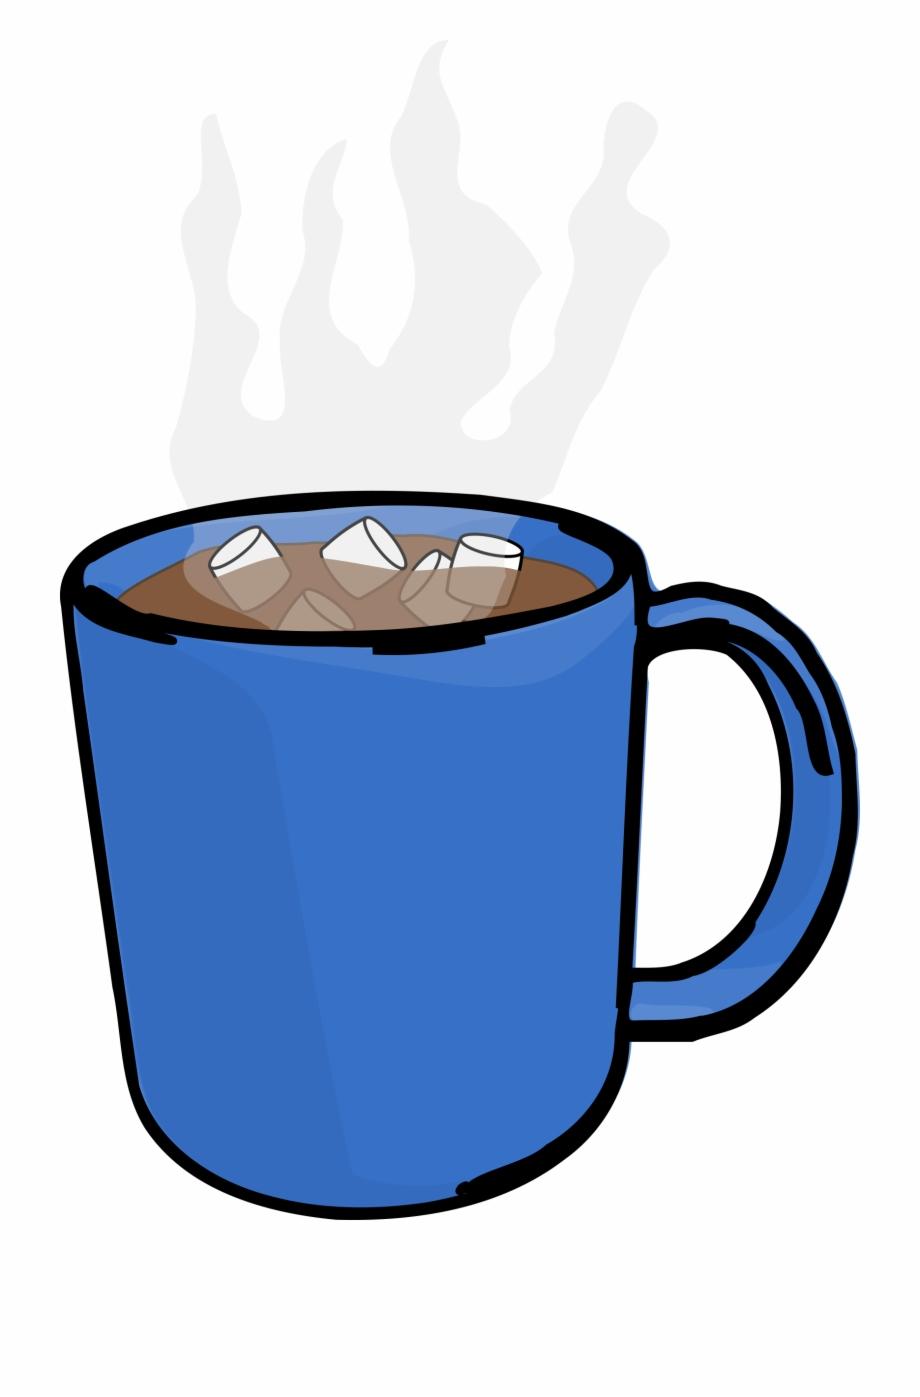 Hot Chocolate Mug Png - Hot Chocolate Mug Clipart ...